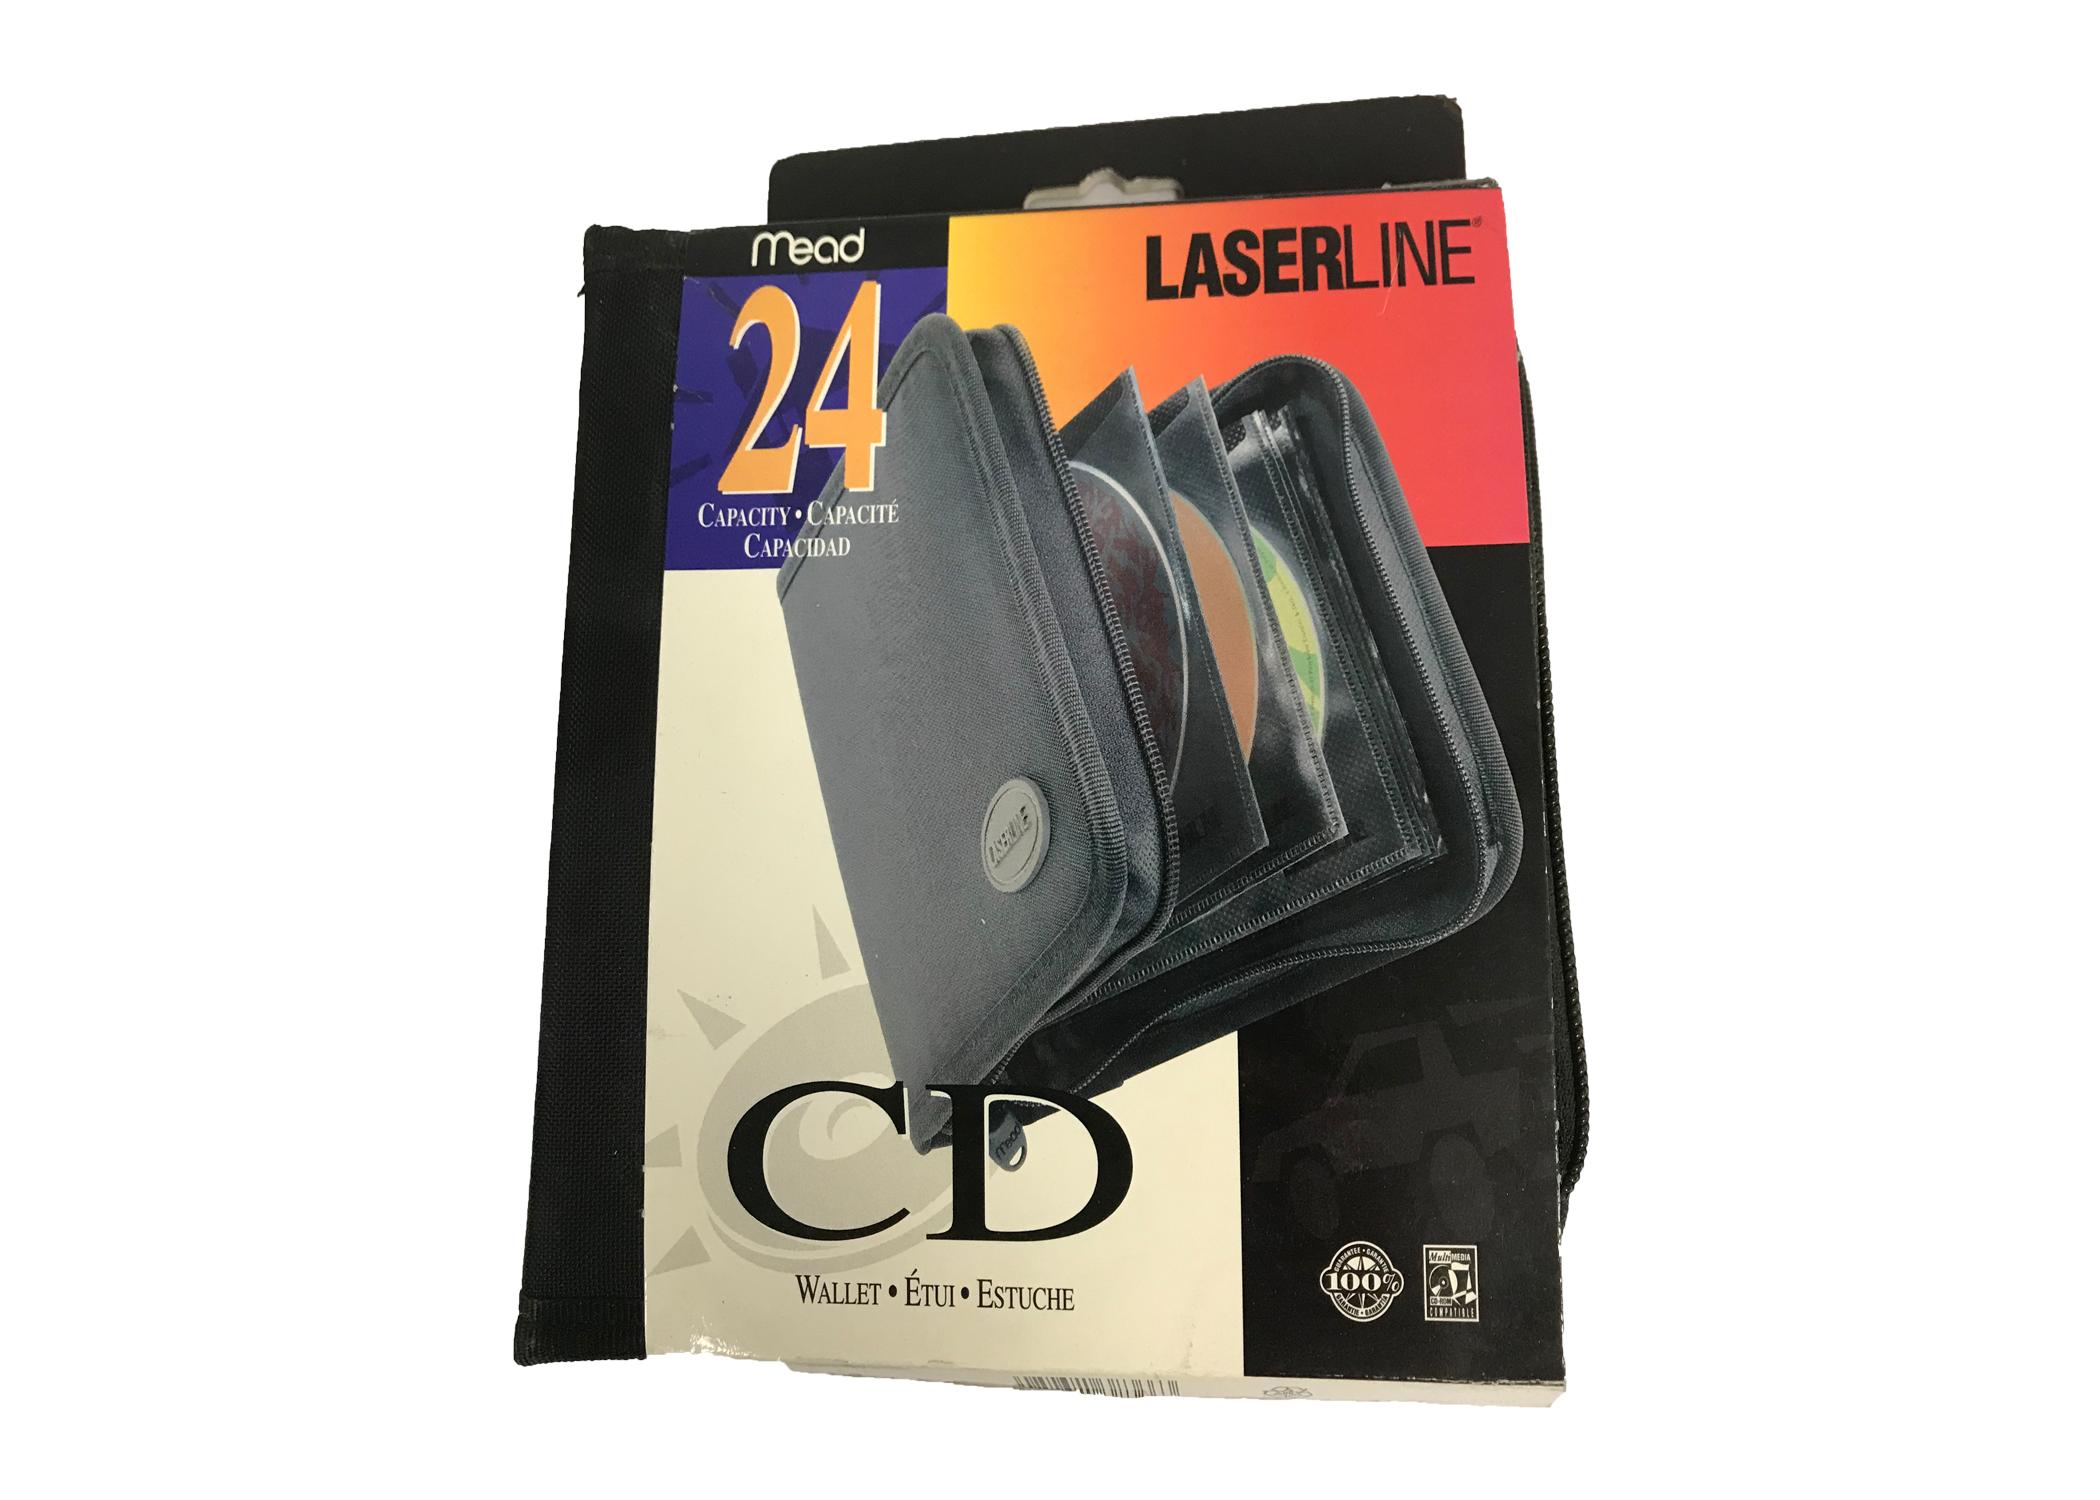 29538366 - Laserline Nylon Card Wallet 24 CD or DVD Capacity